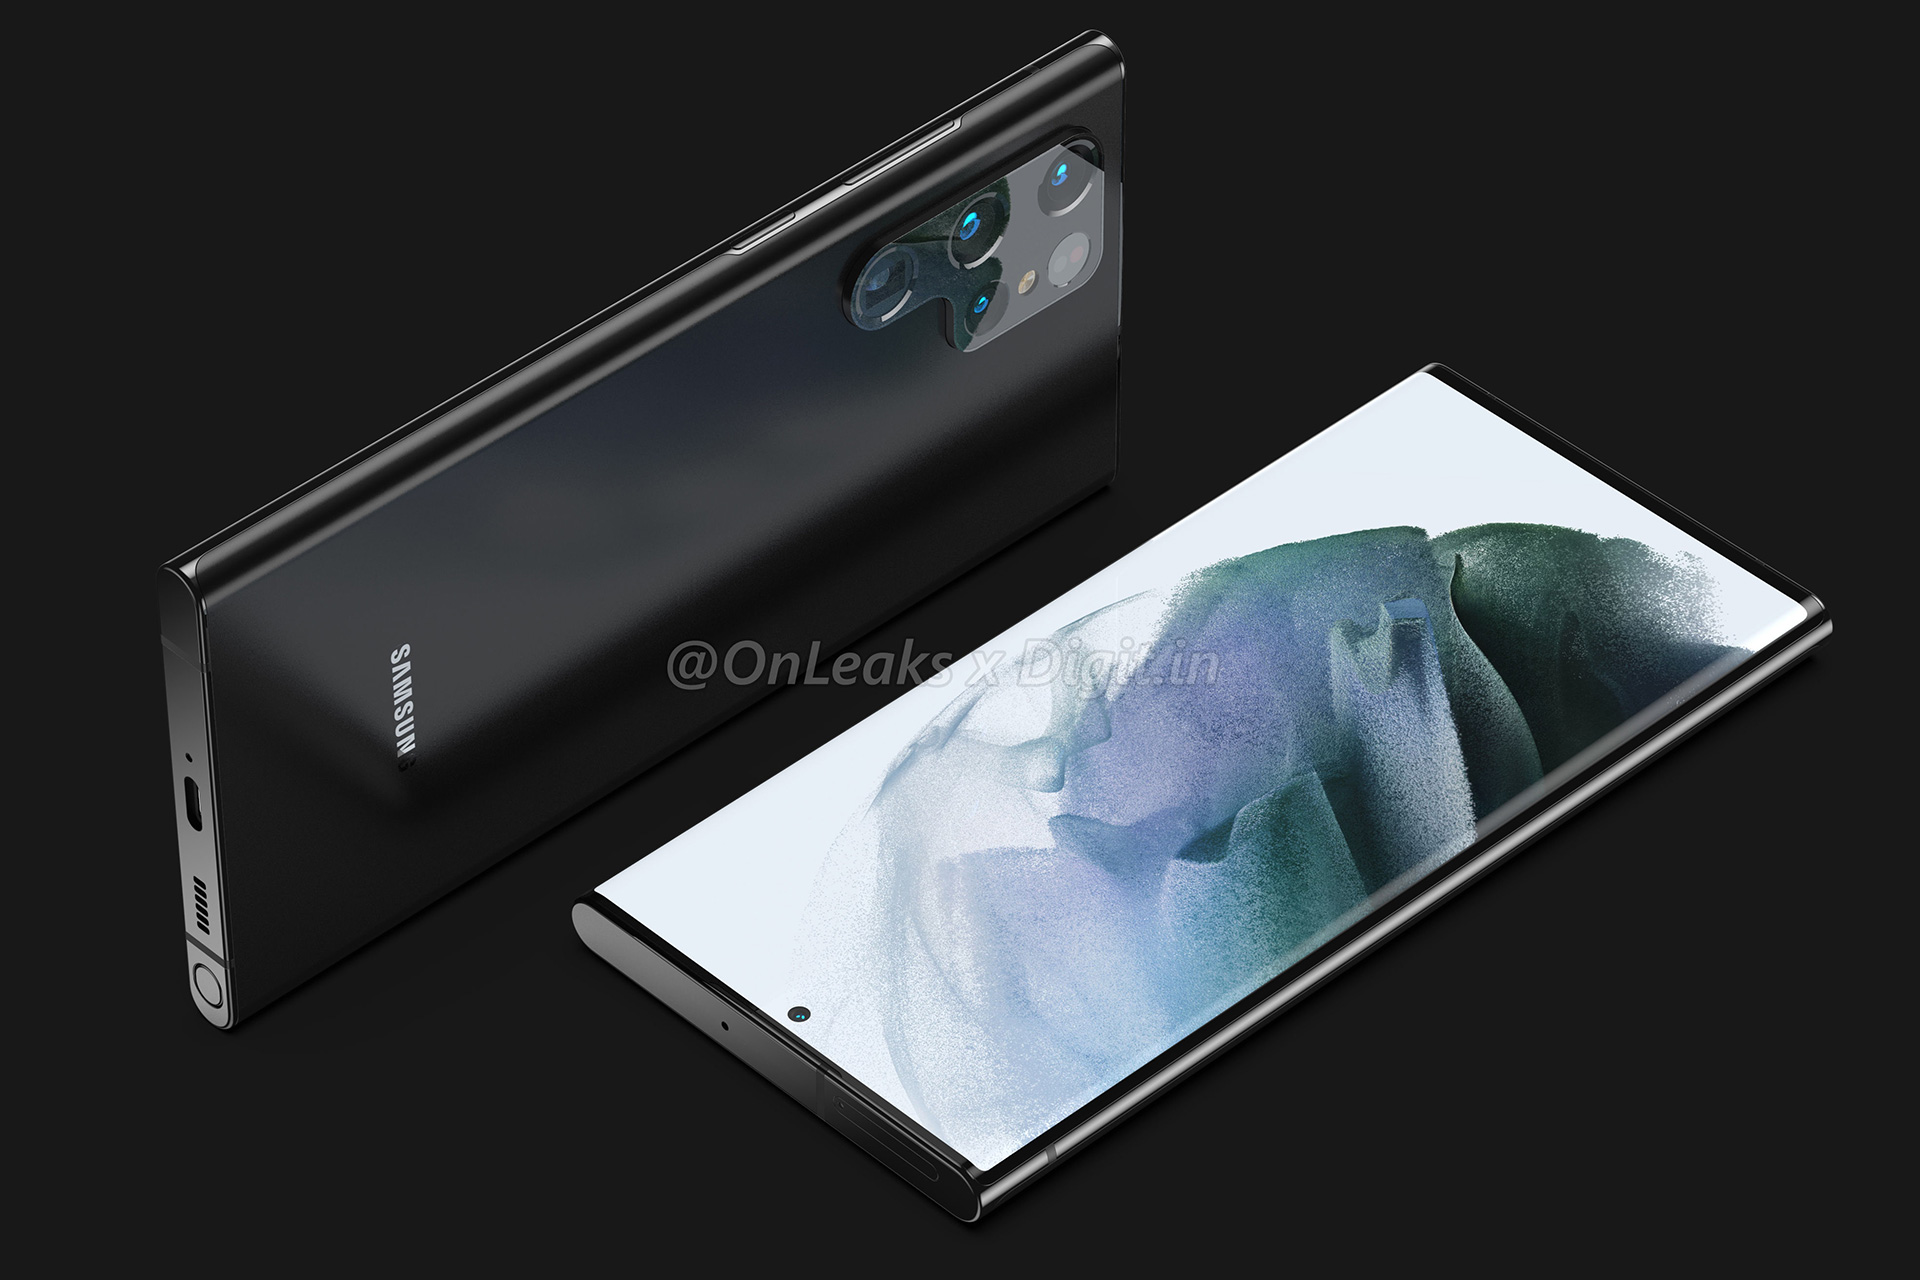 Galaxy S22 Ultra leak